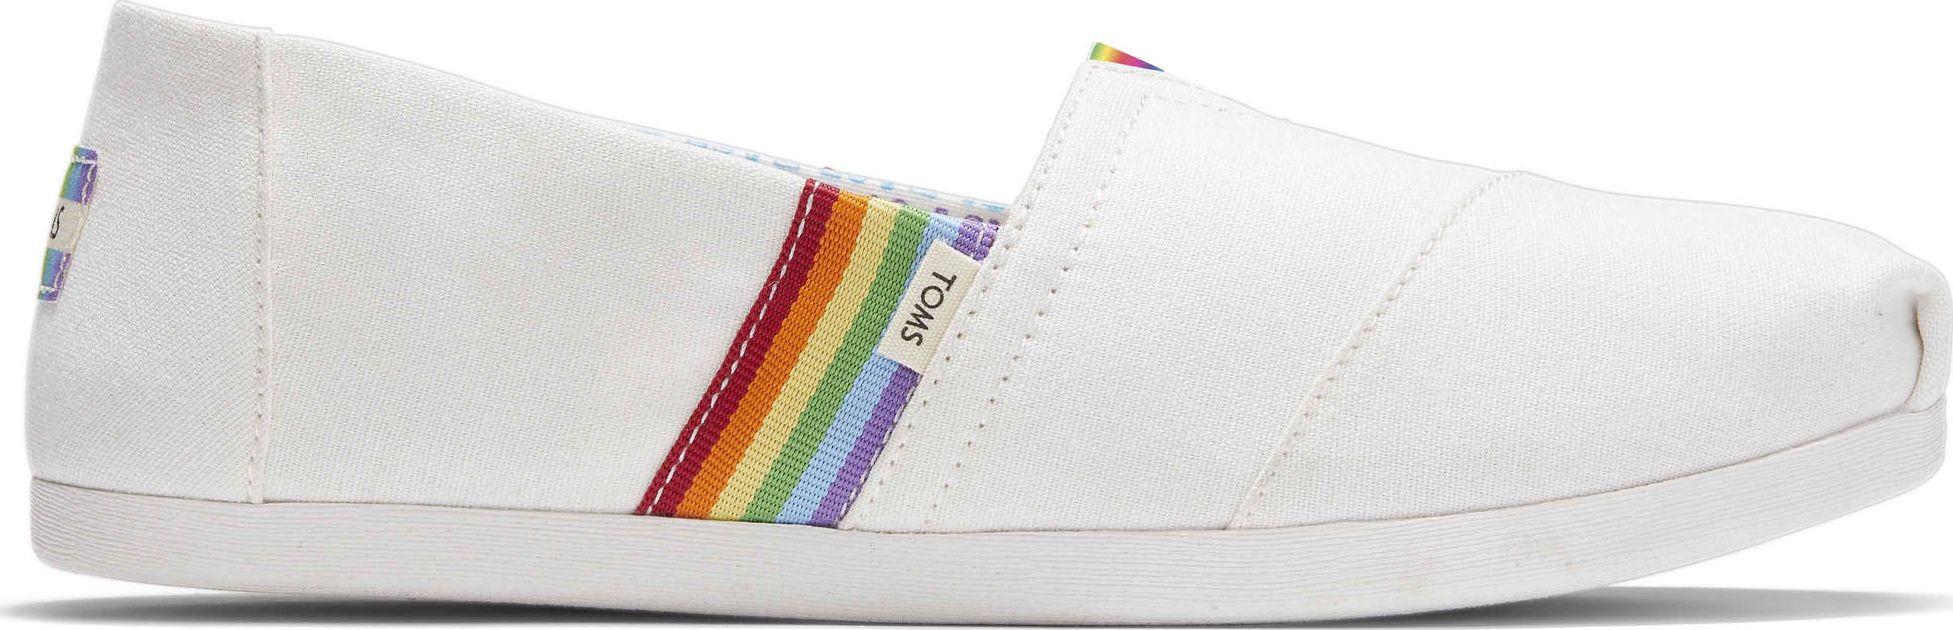 TOMS Unity Rainbow Canvas Women's Alpargata White 39